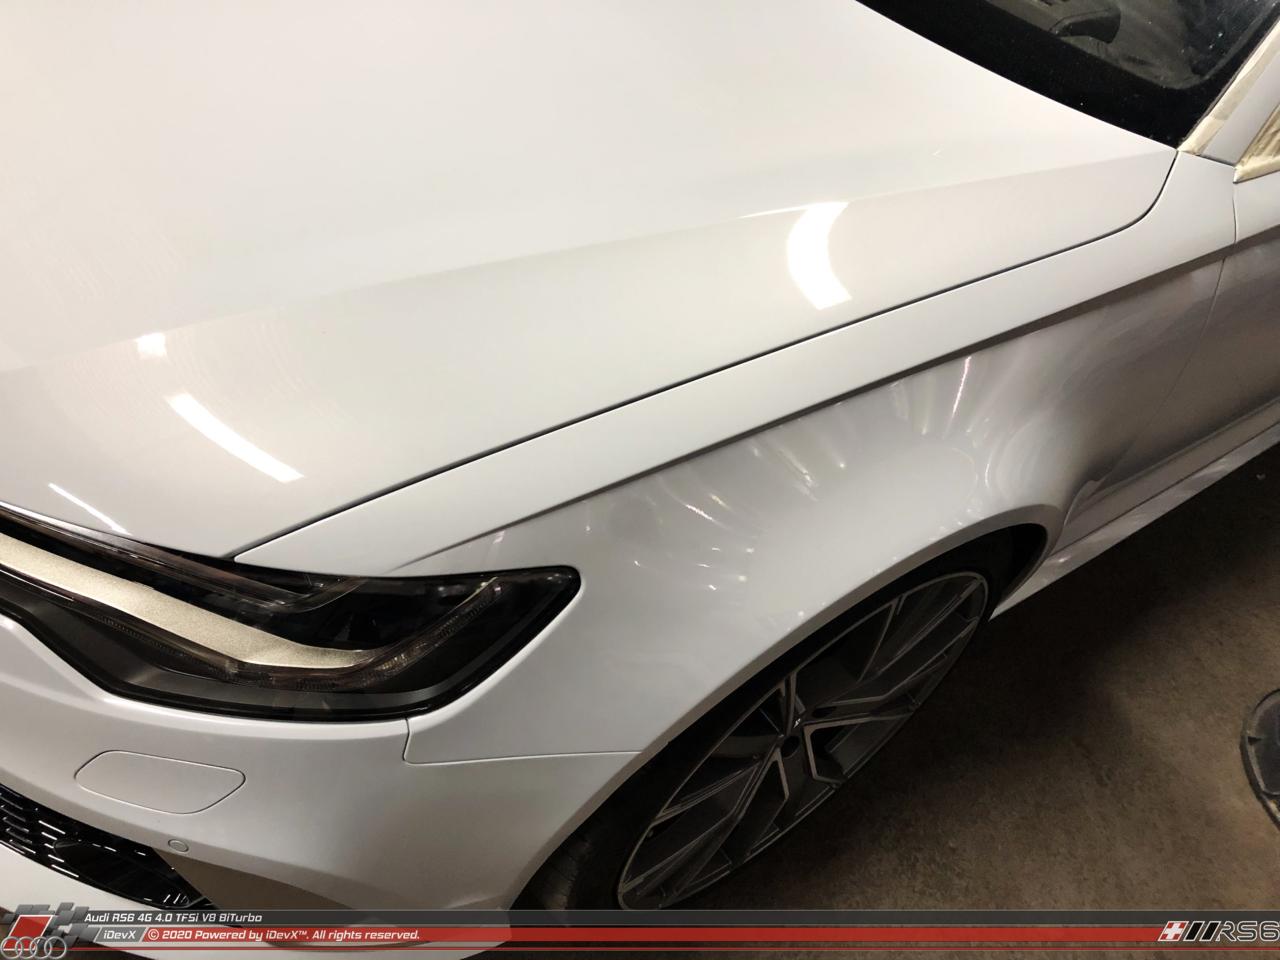 05_08.2019_Audi-RS6_iDevX_018.png